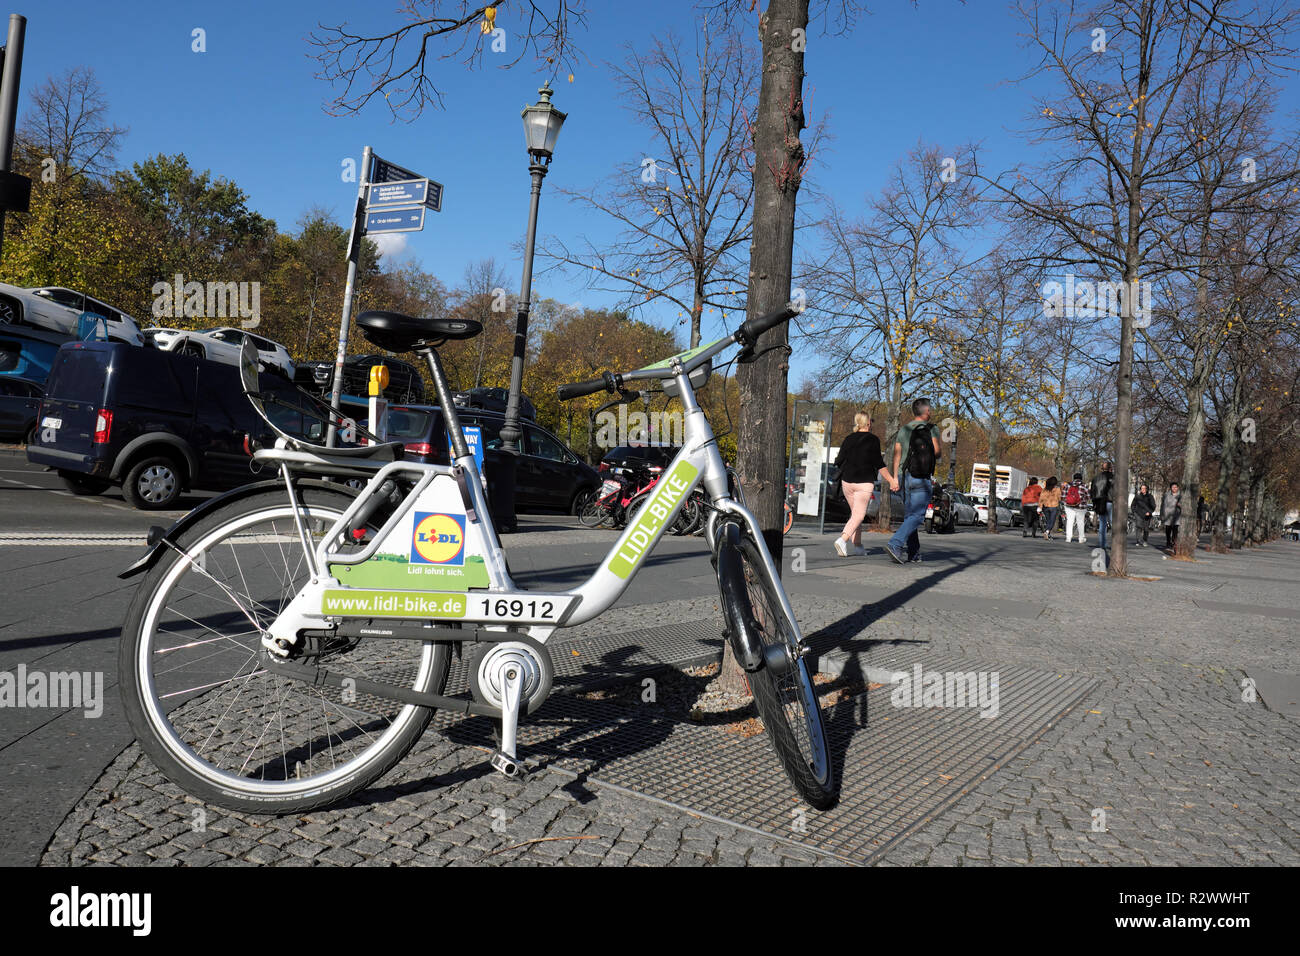 bike rental berlin stock photos bike rental berlin stock. Black Bedroom Furniture Sets. Home Design Ideas